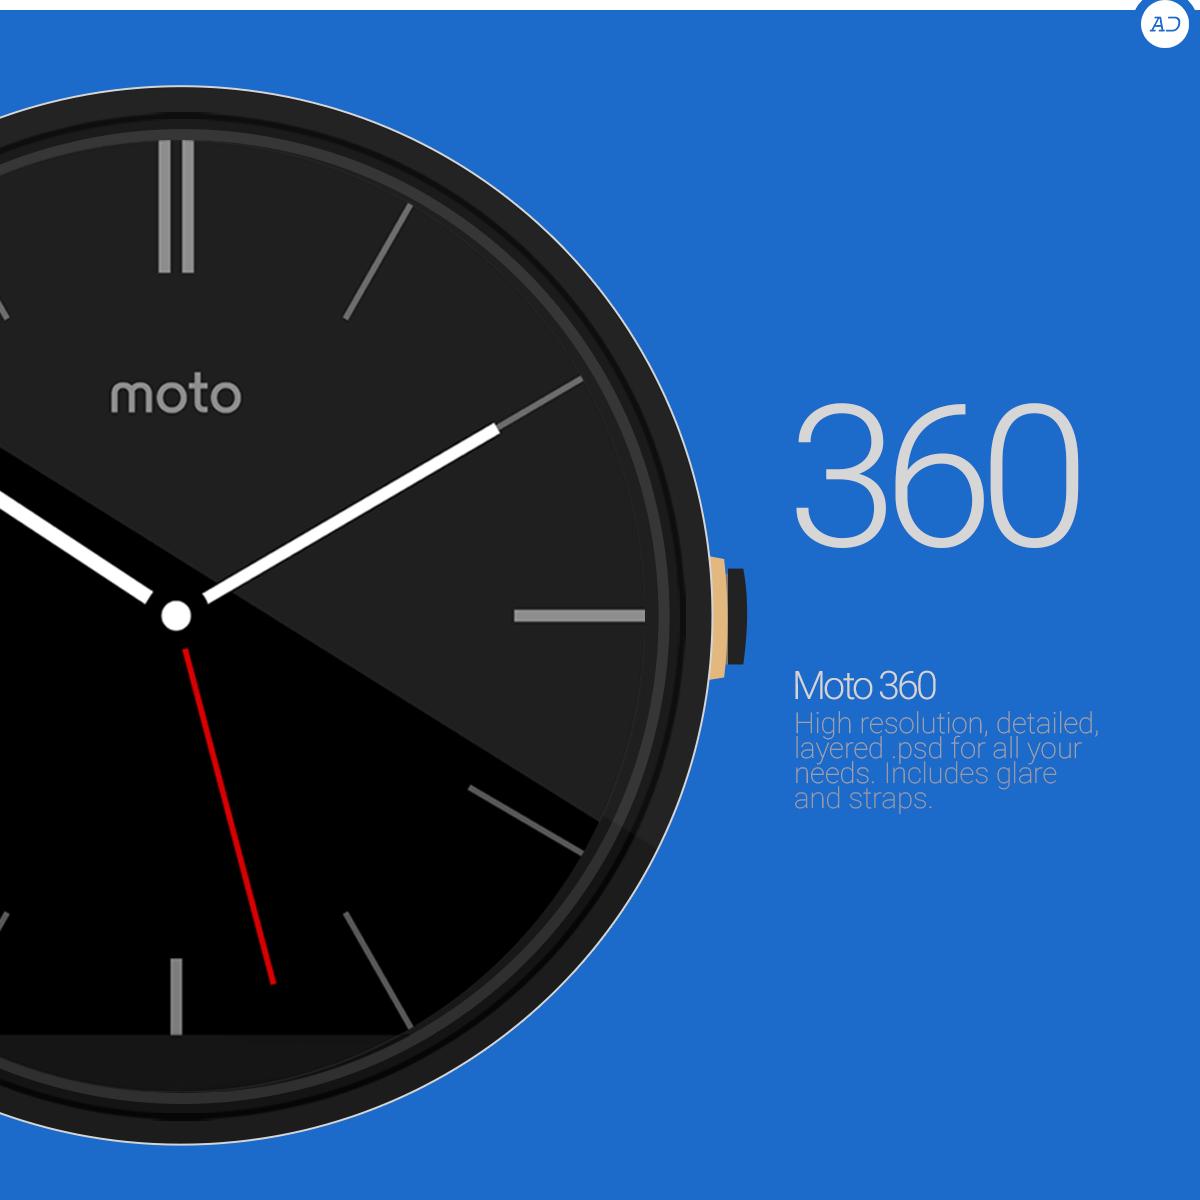 Moto 360 : PSD by danishprakash